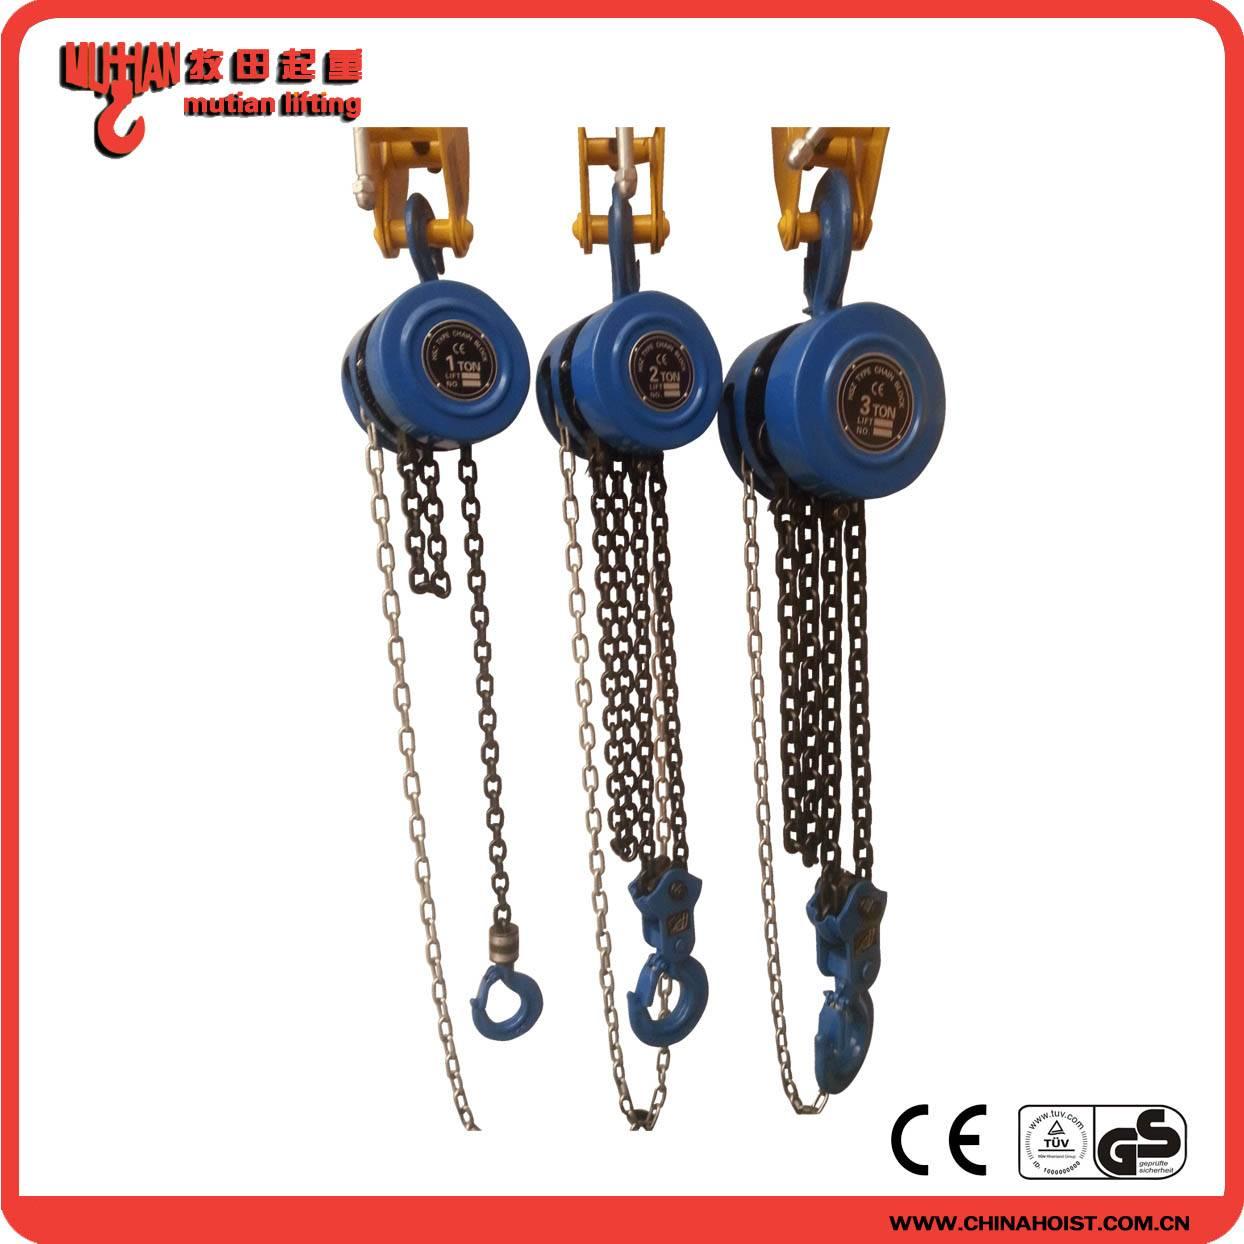 1T/2T/3T HSZ type construction manual hand chain hoist